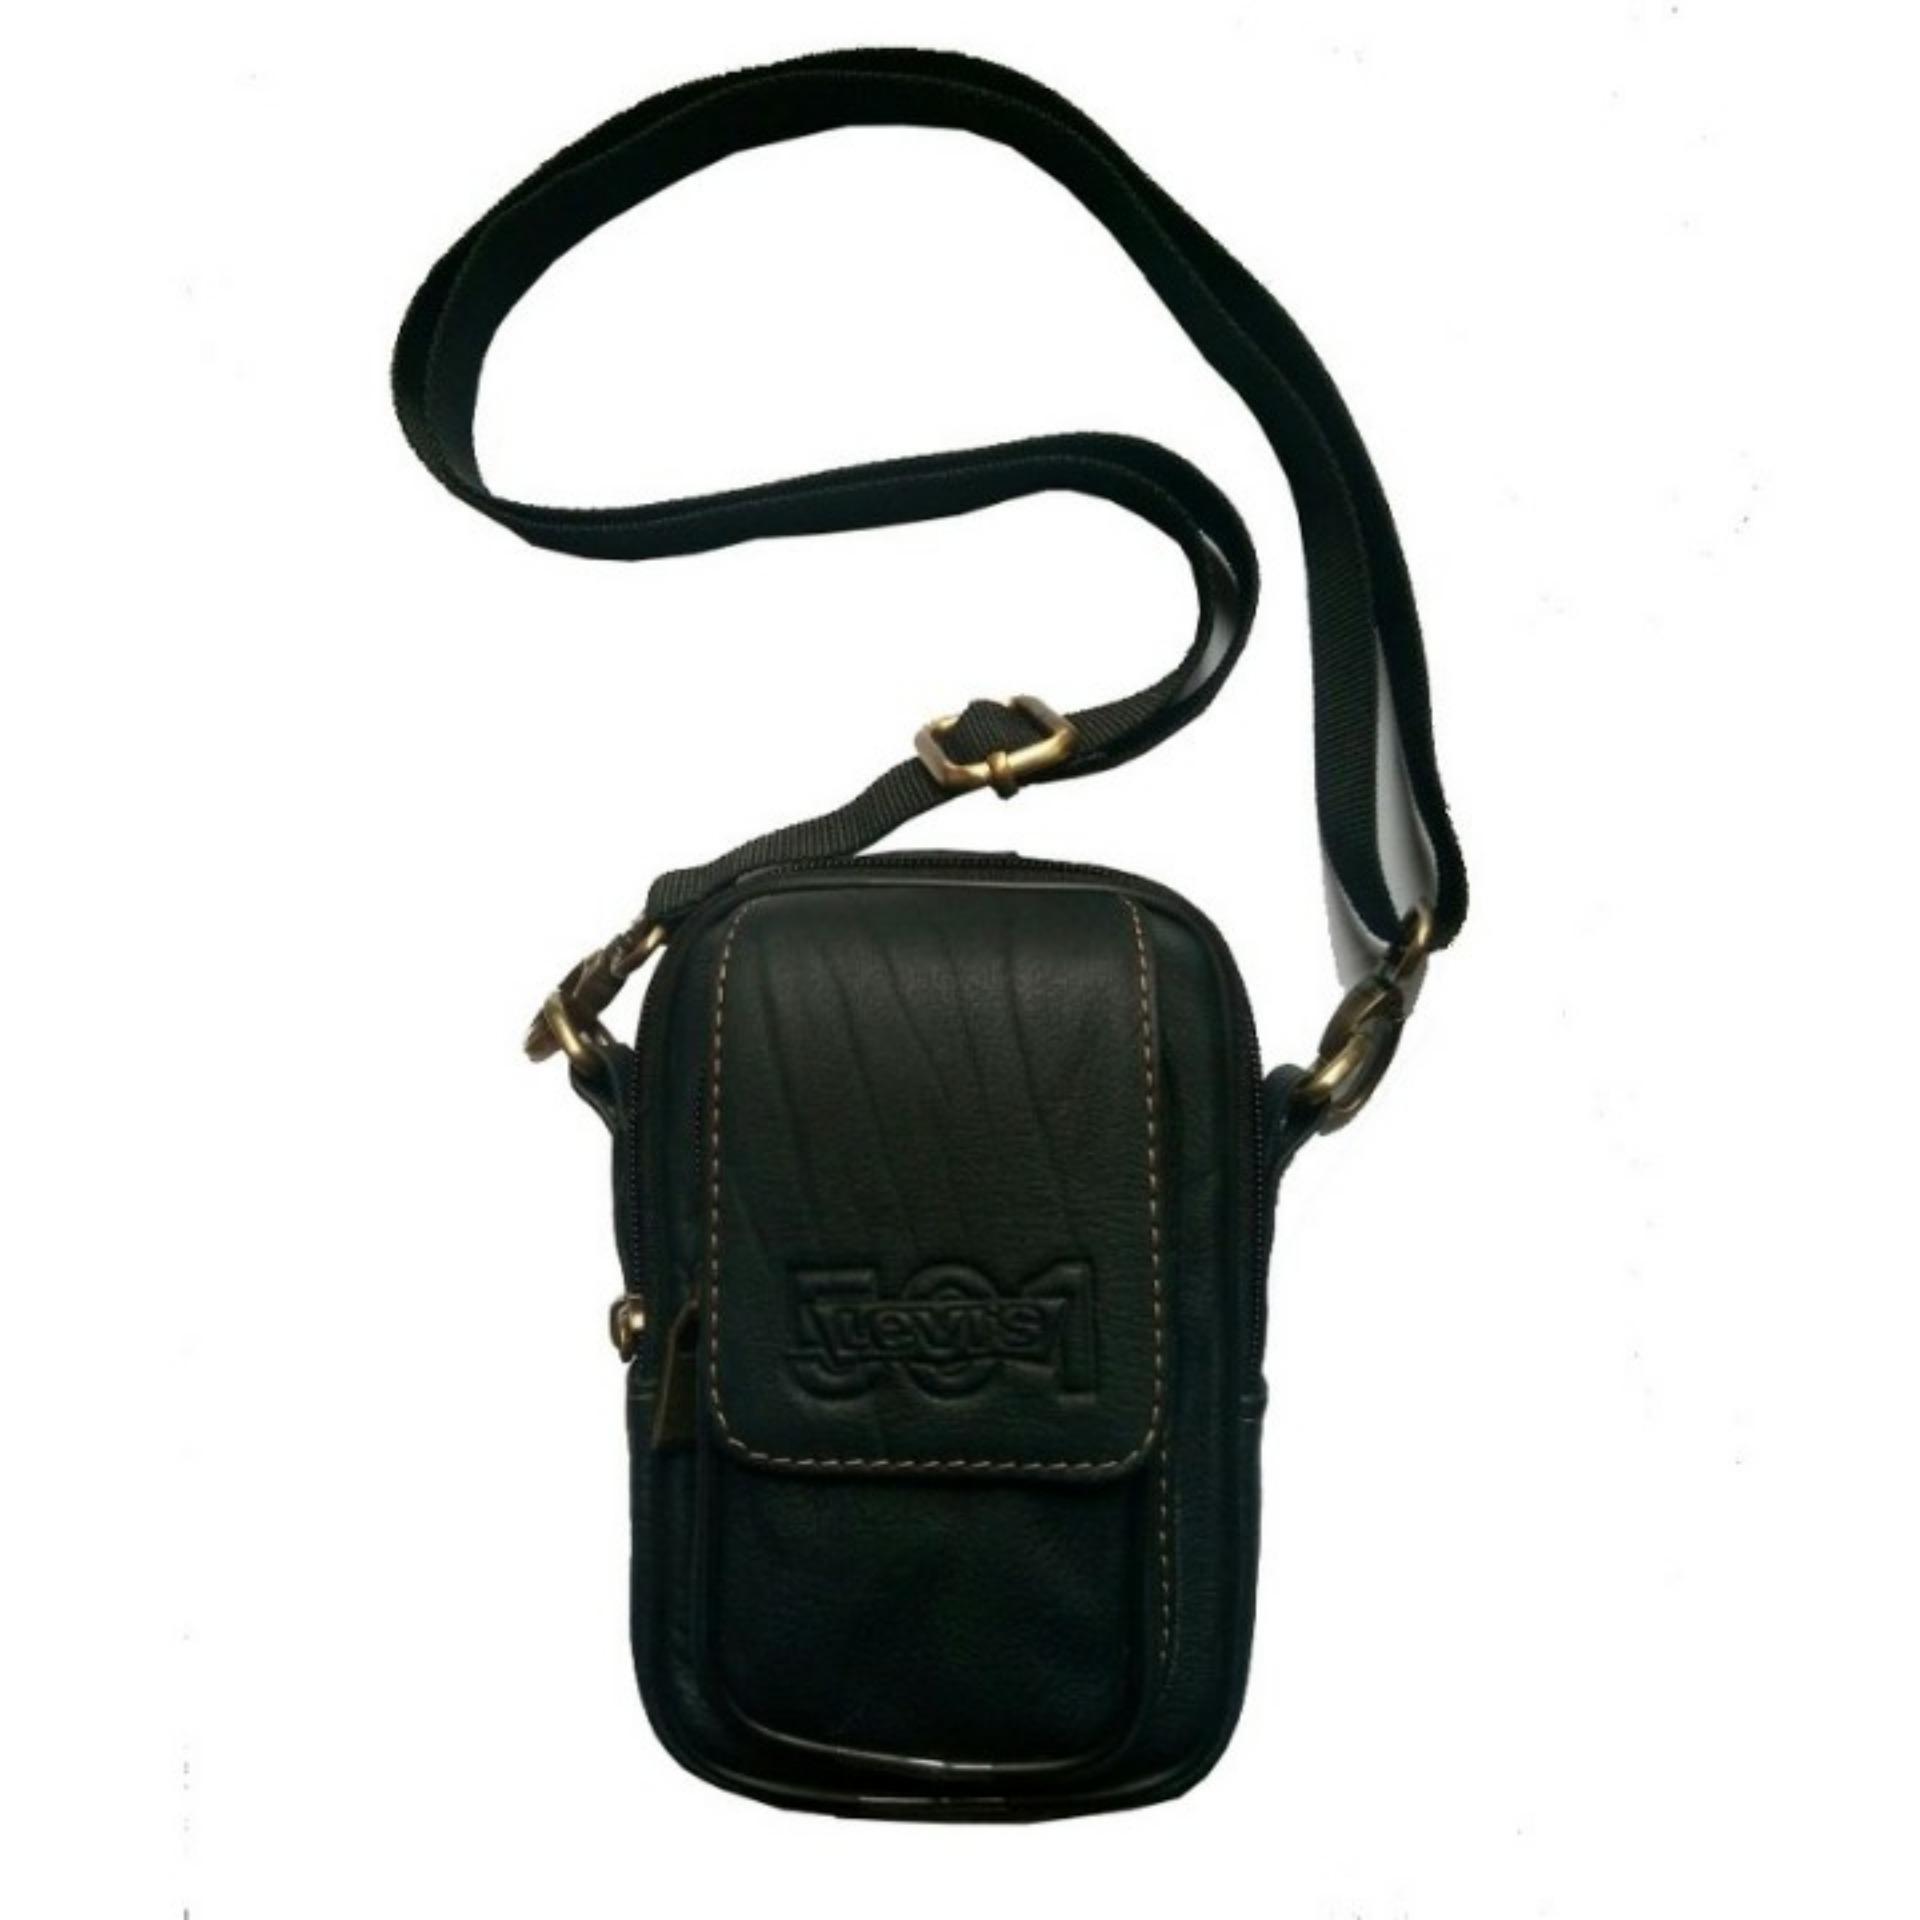 Tas Pinggang / Slempang 100% Kulit asli Waist Bag Dompet HP Pria - Hitam